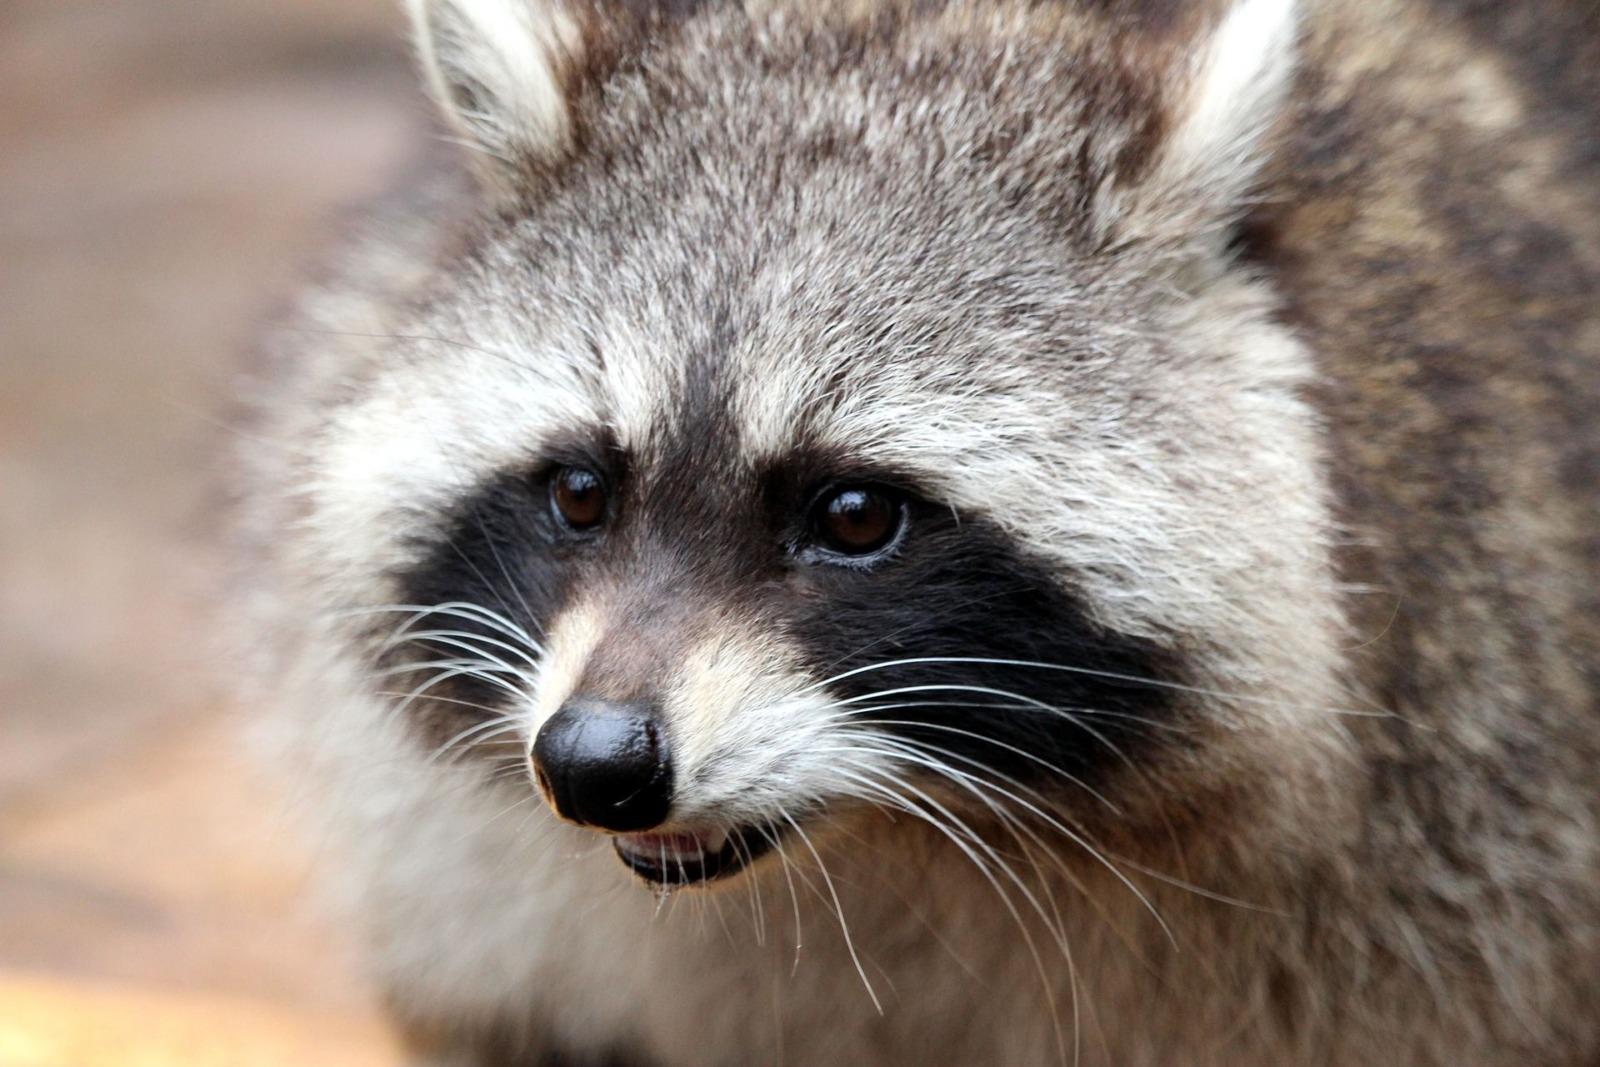 waschbaer raccoon Lolame pixabay